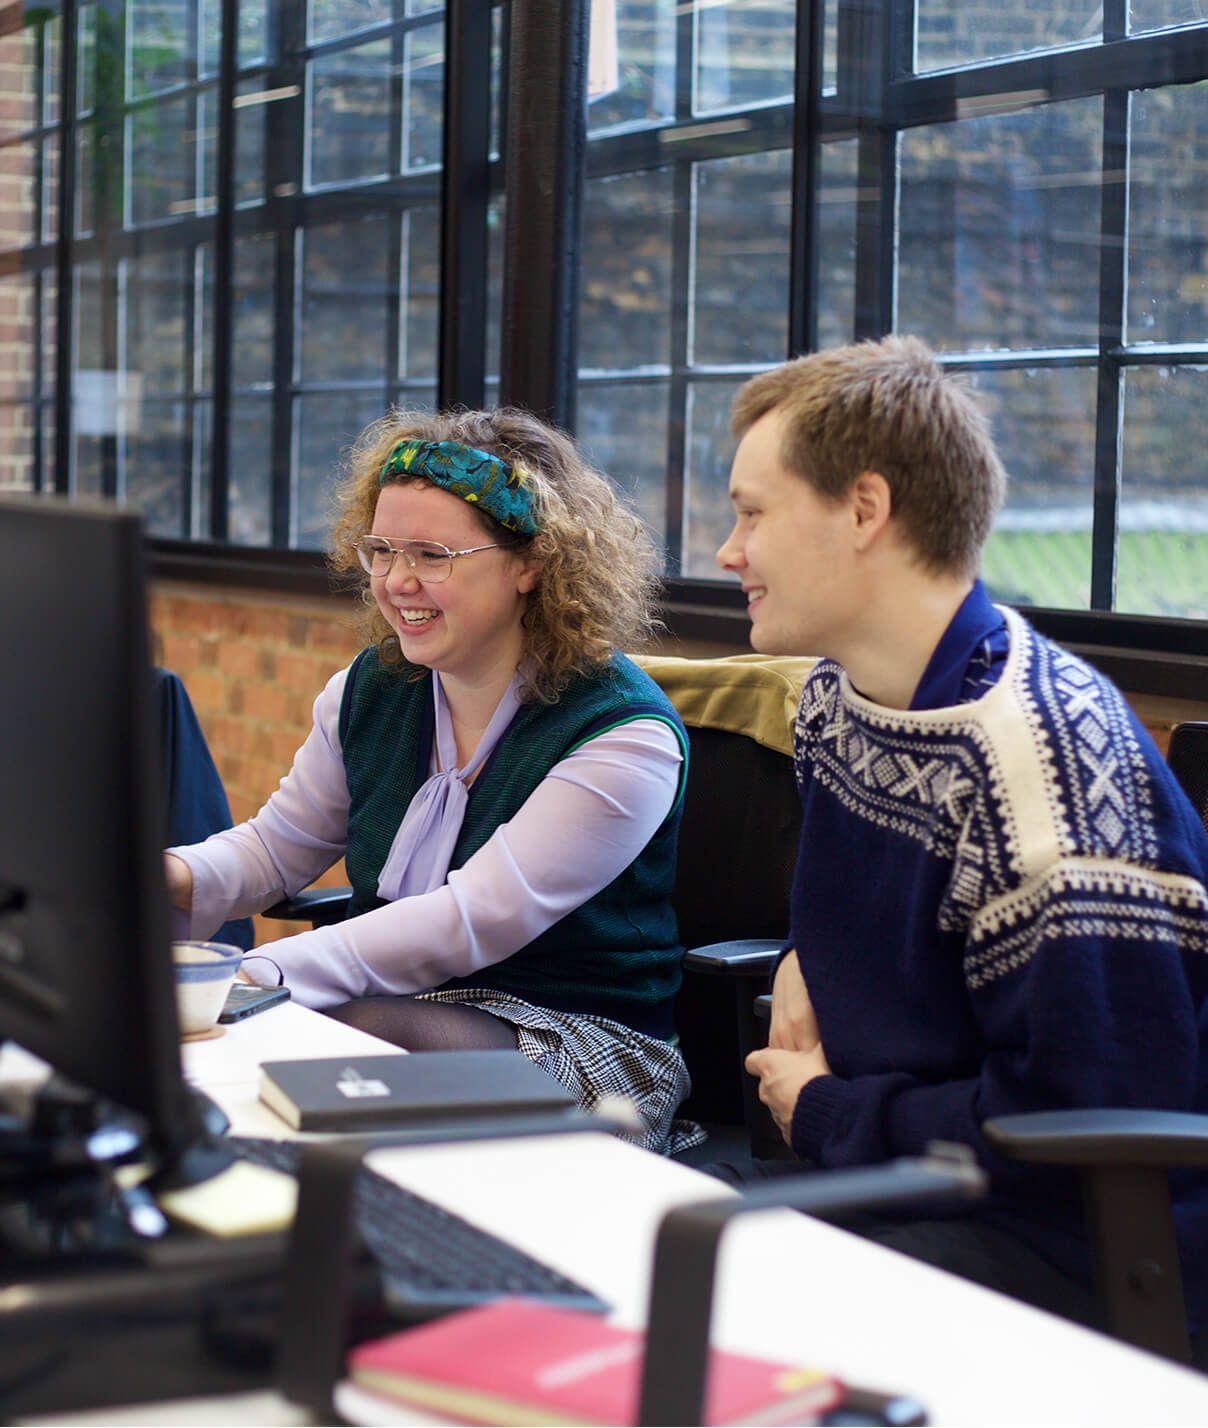 woman and man looking at computer screen smiling